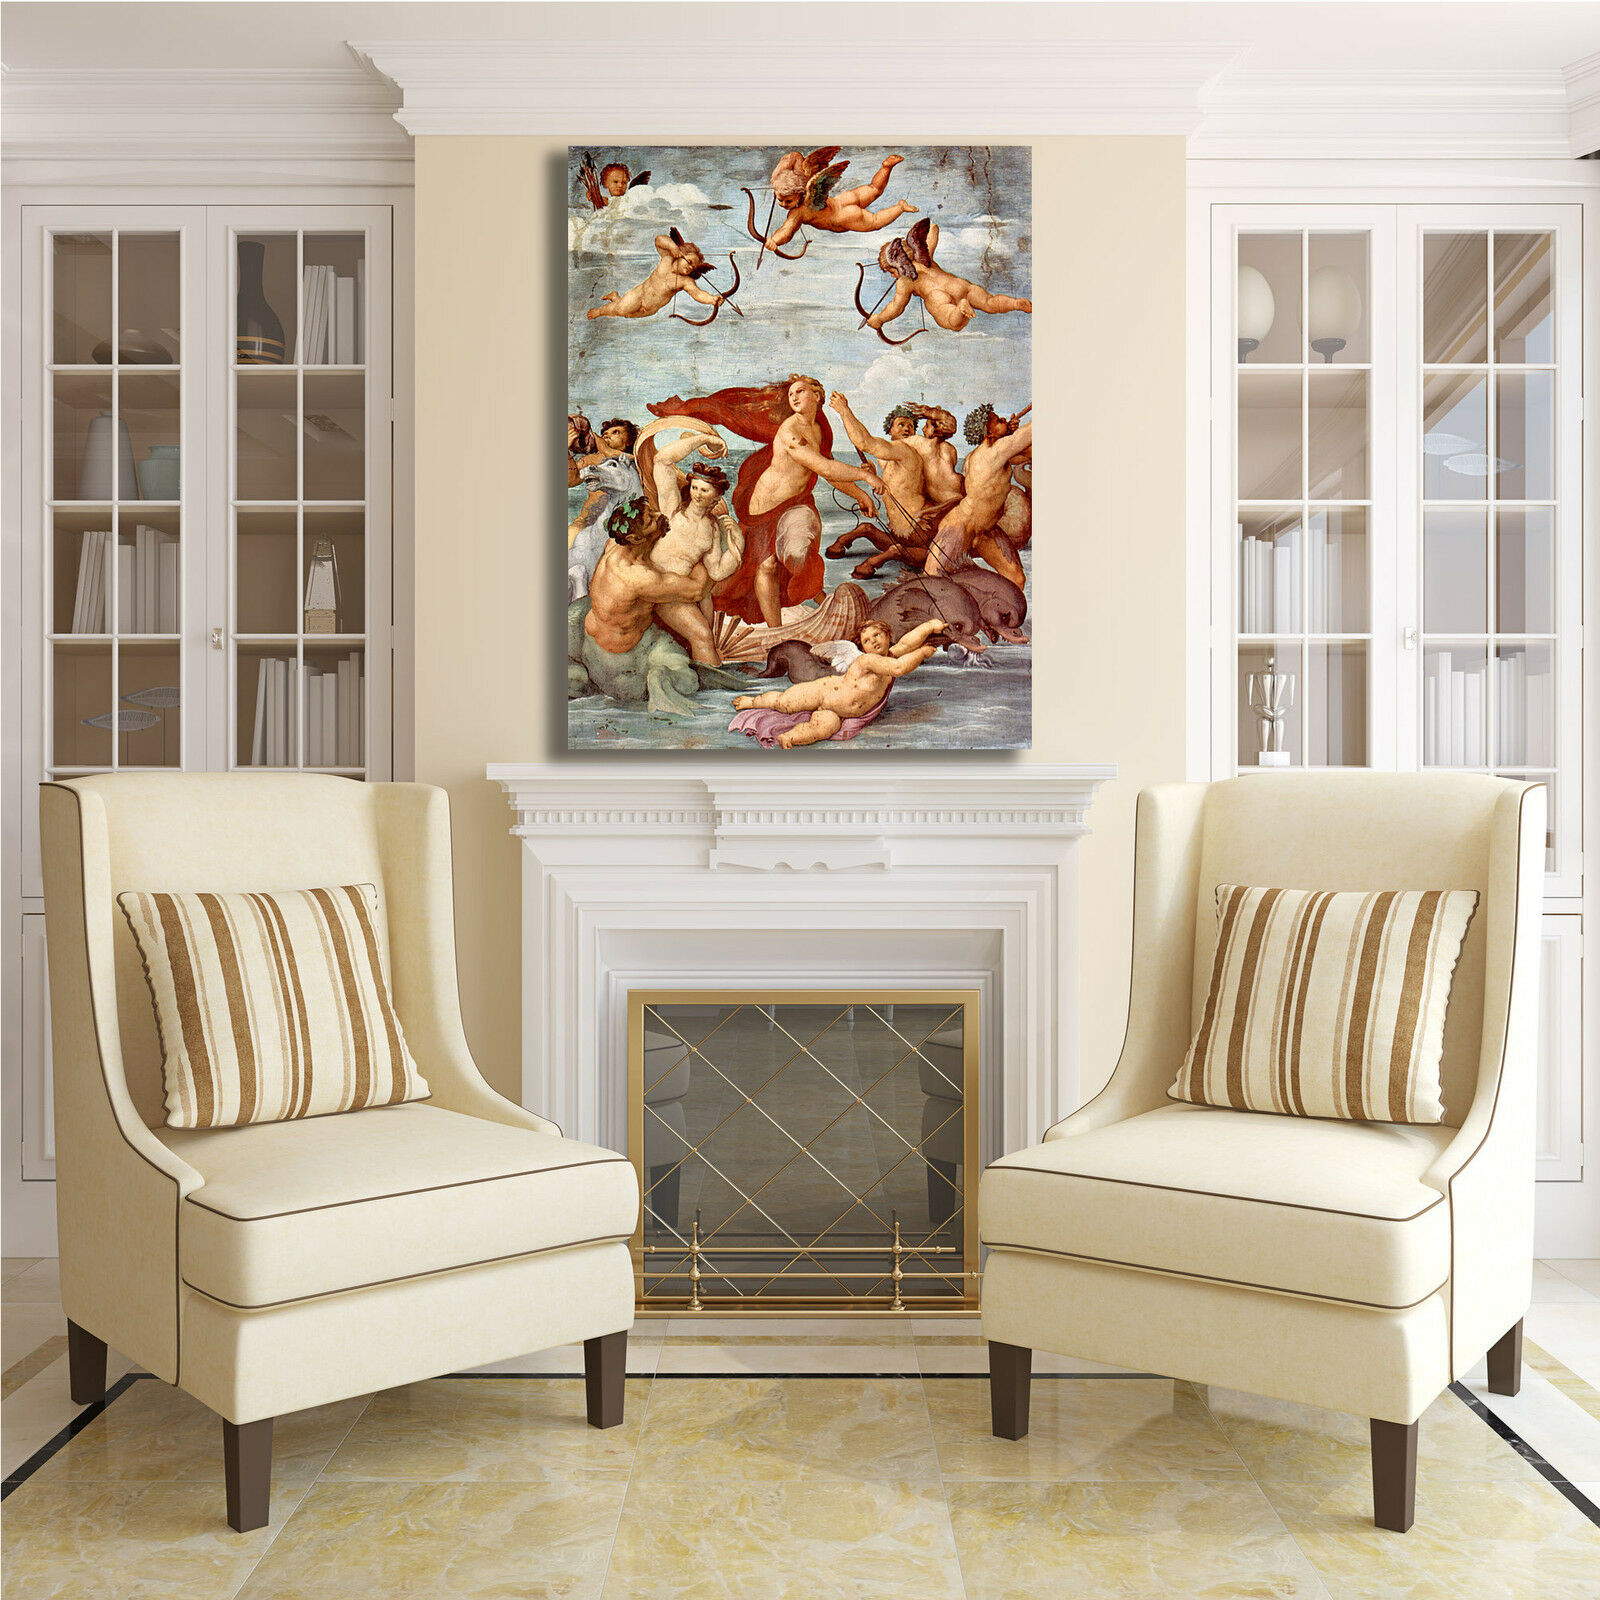 Raffaello trionfo di Galatea quadro stampa tela tela stampa dipinto telaio arRouge o casa bf5751